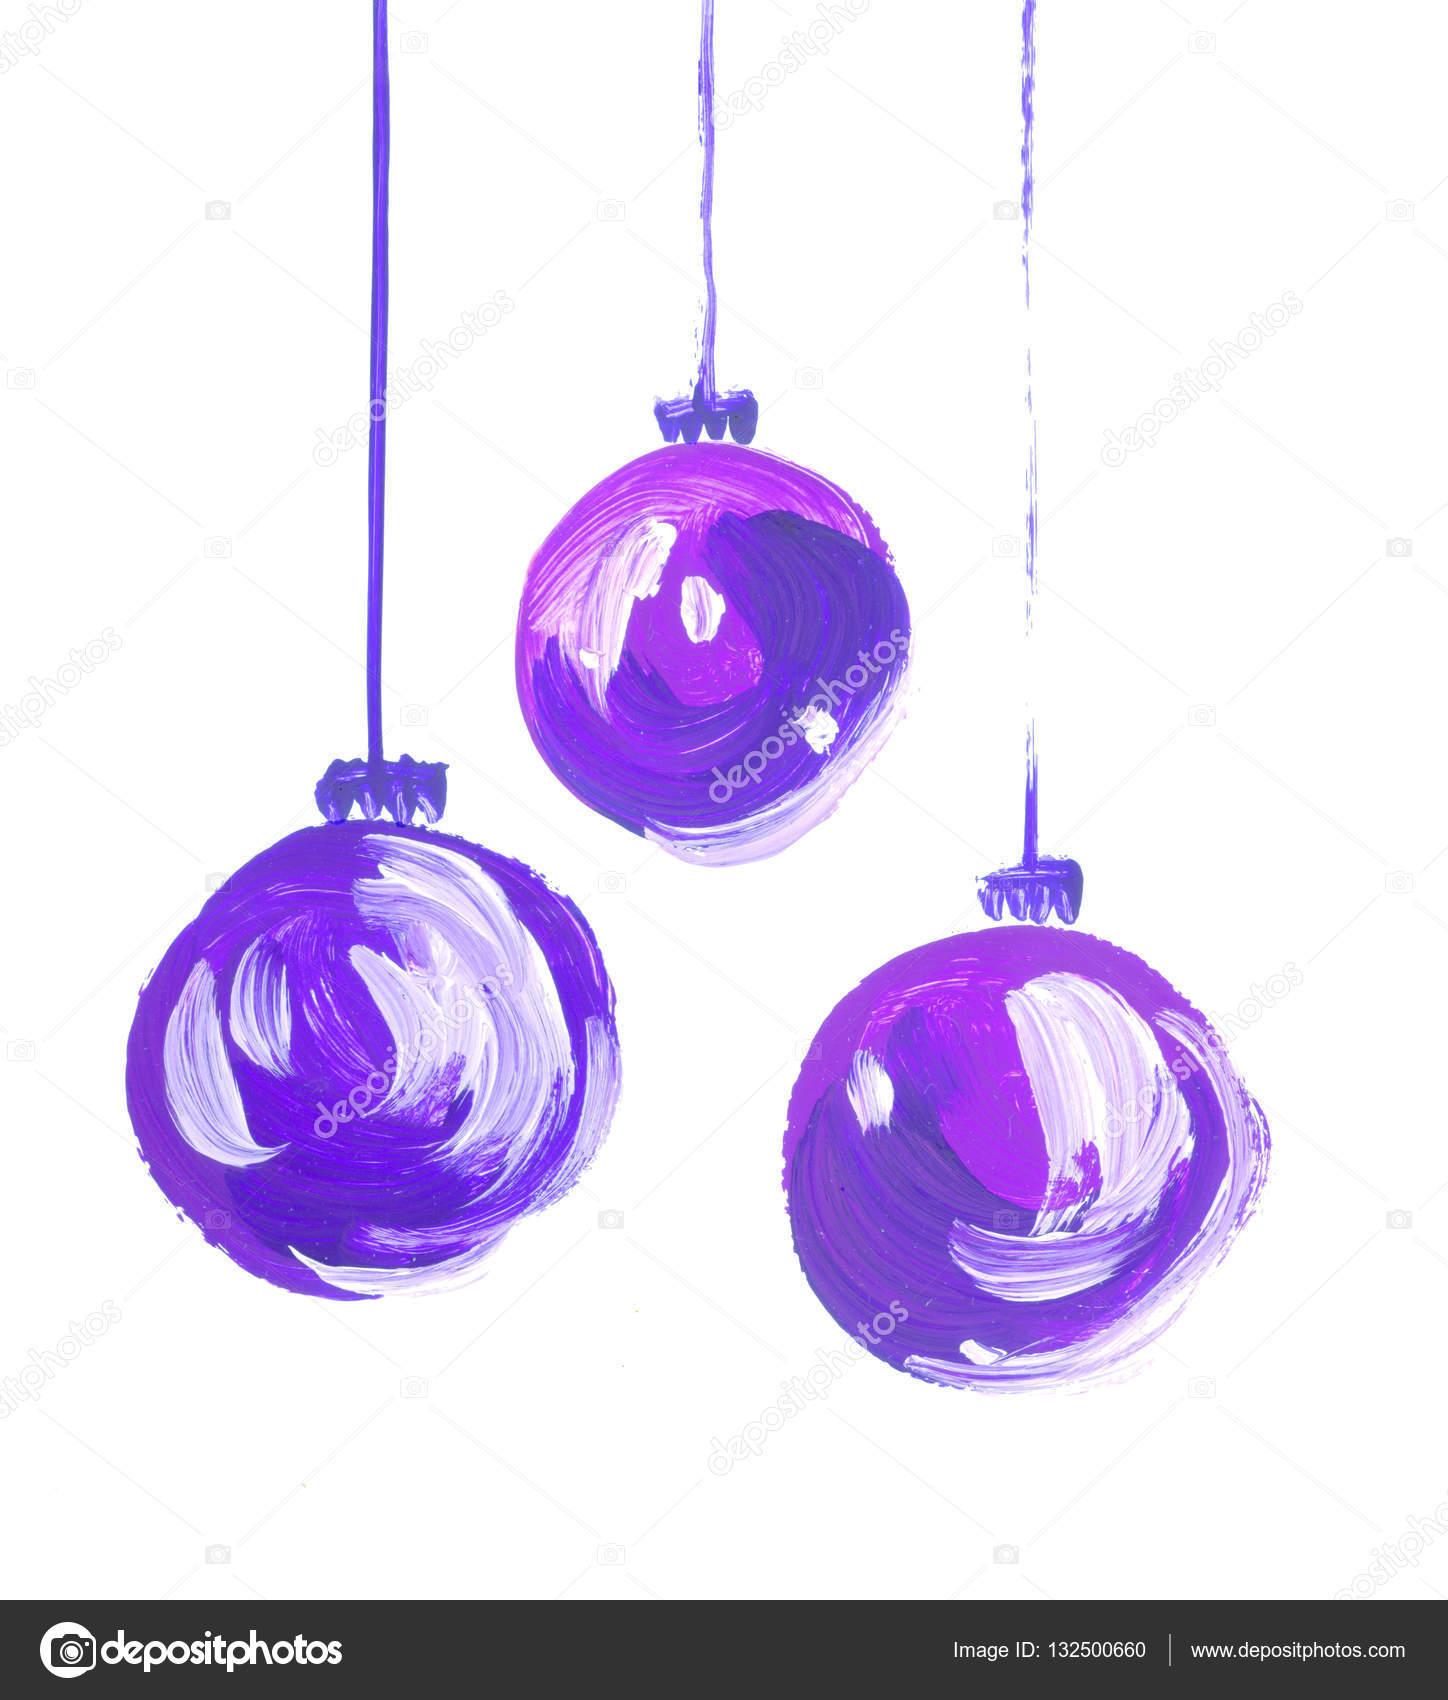 Drawn christmas ornaments bulb Bulbs christmas bulbs drawn set